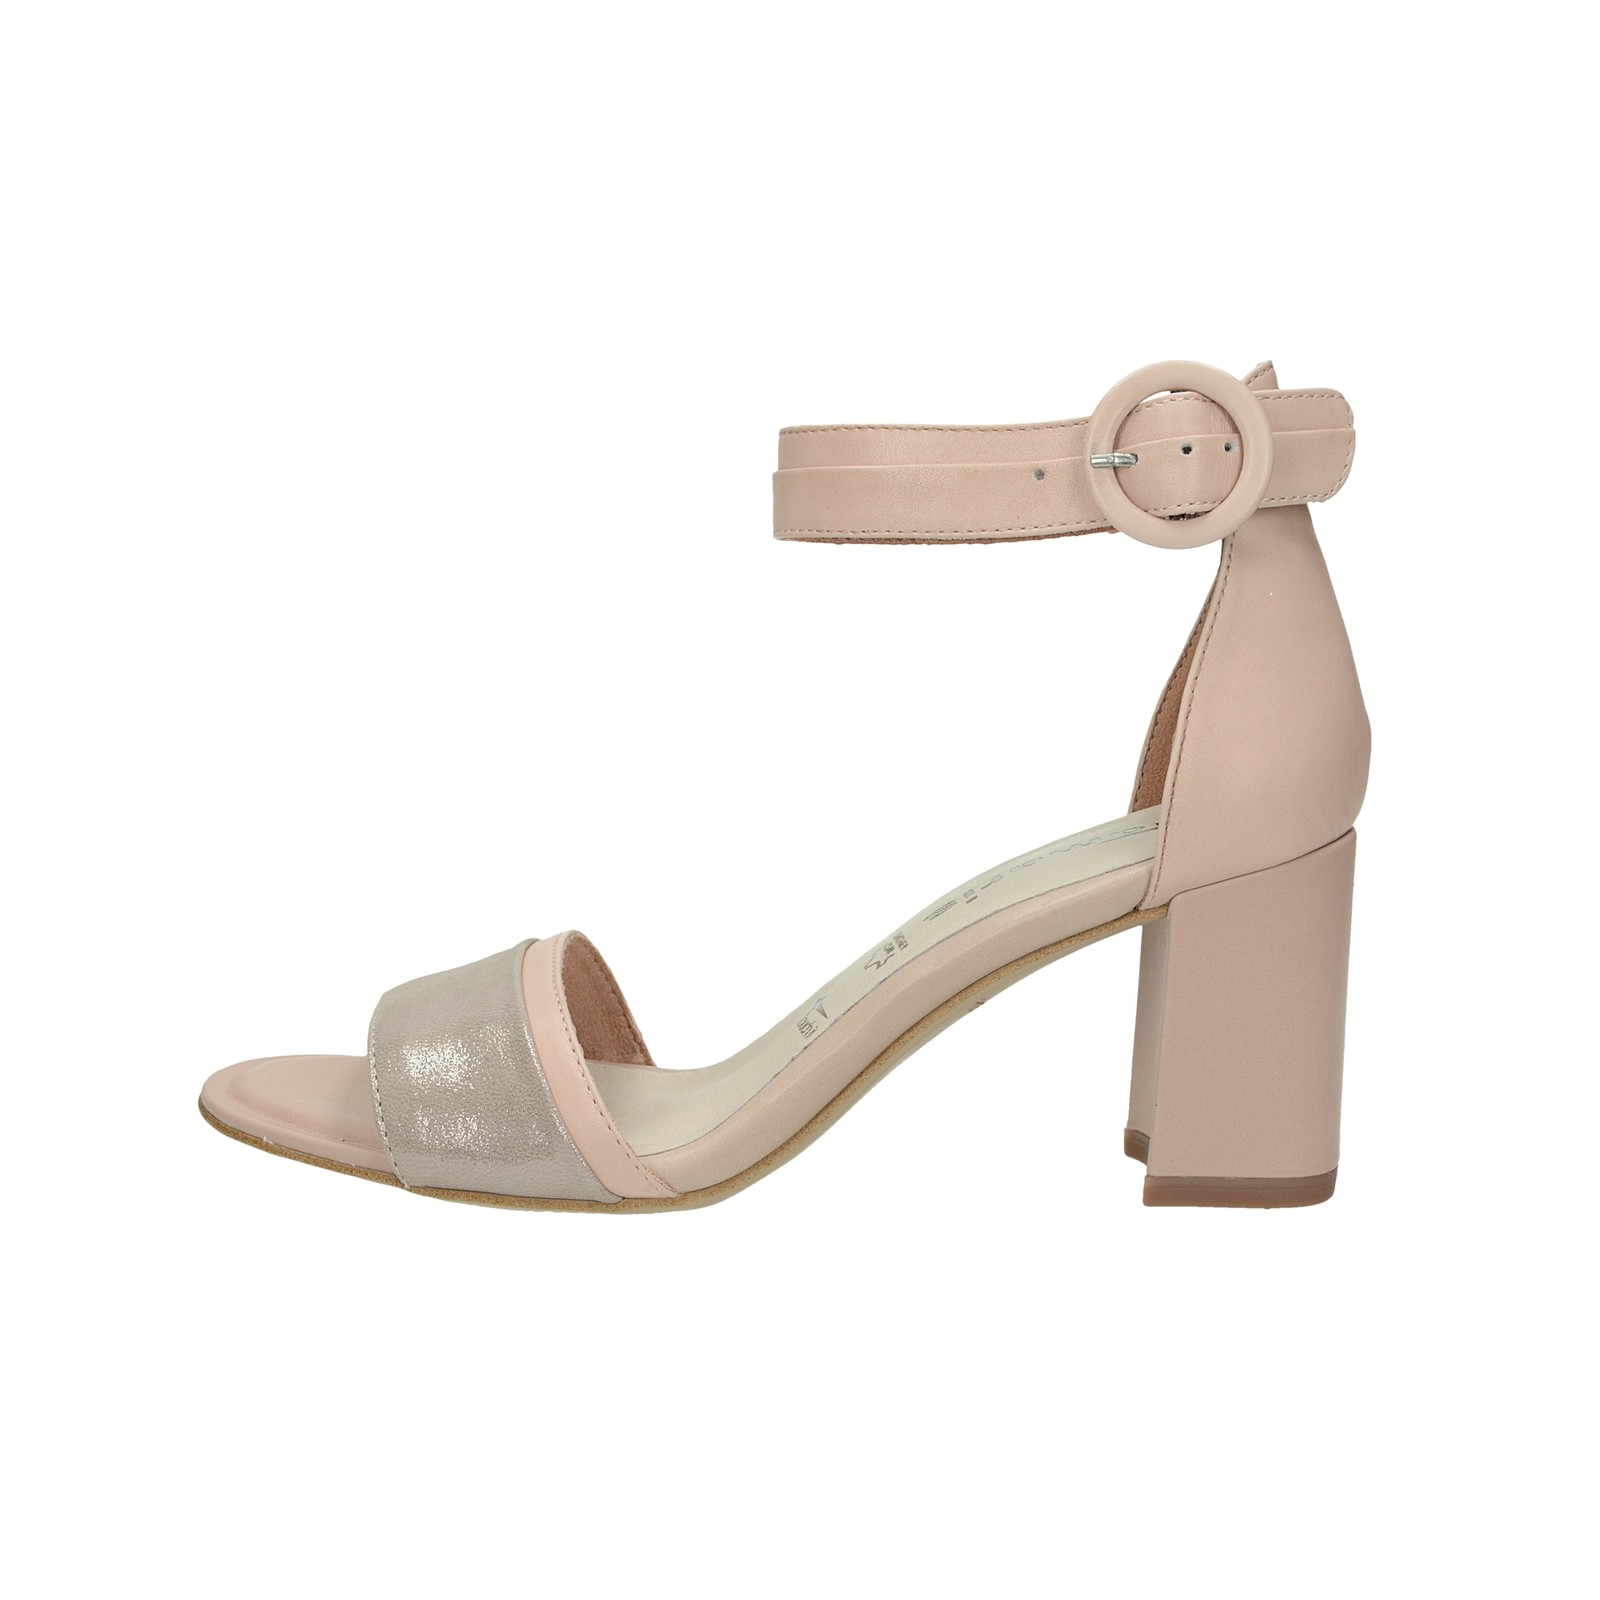 56e1a0ff3b Tamaris dámske kožené sandále - ružové Tamaris dámske kožené sandále -  ružové ...